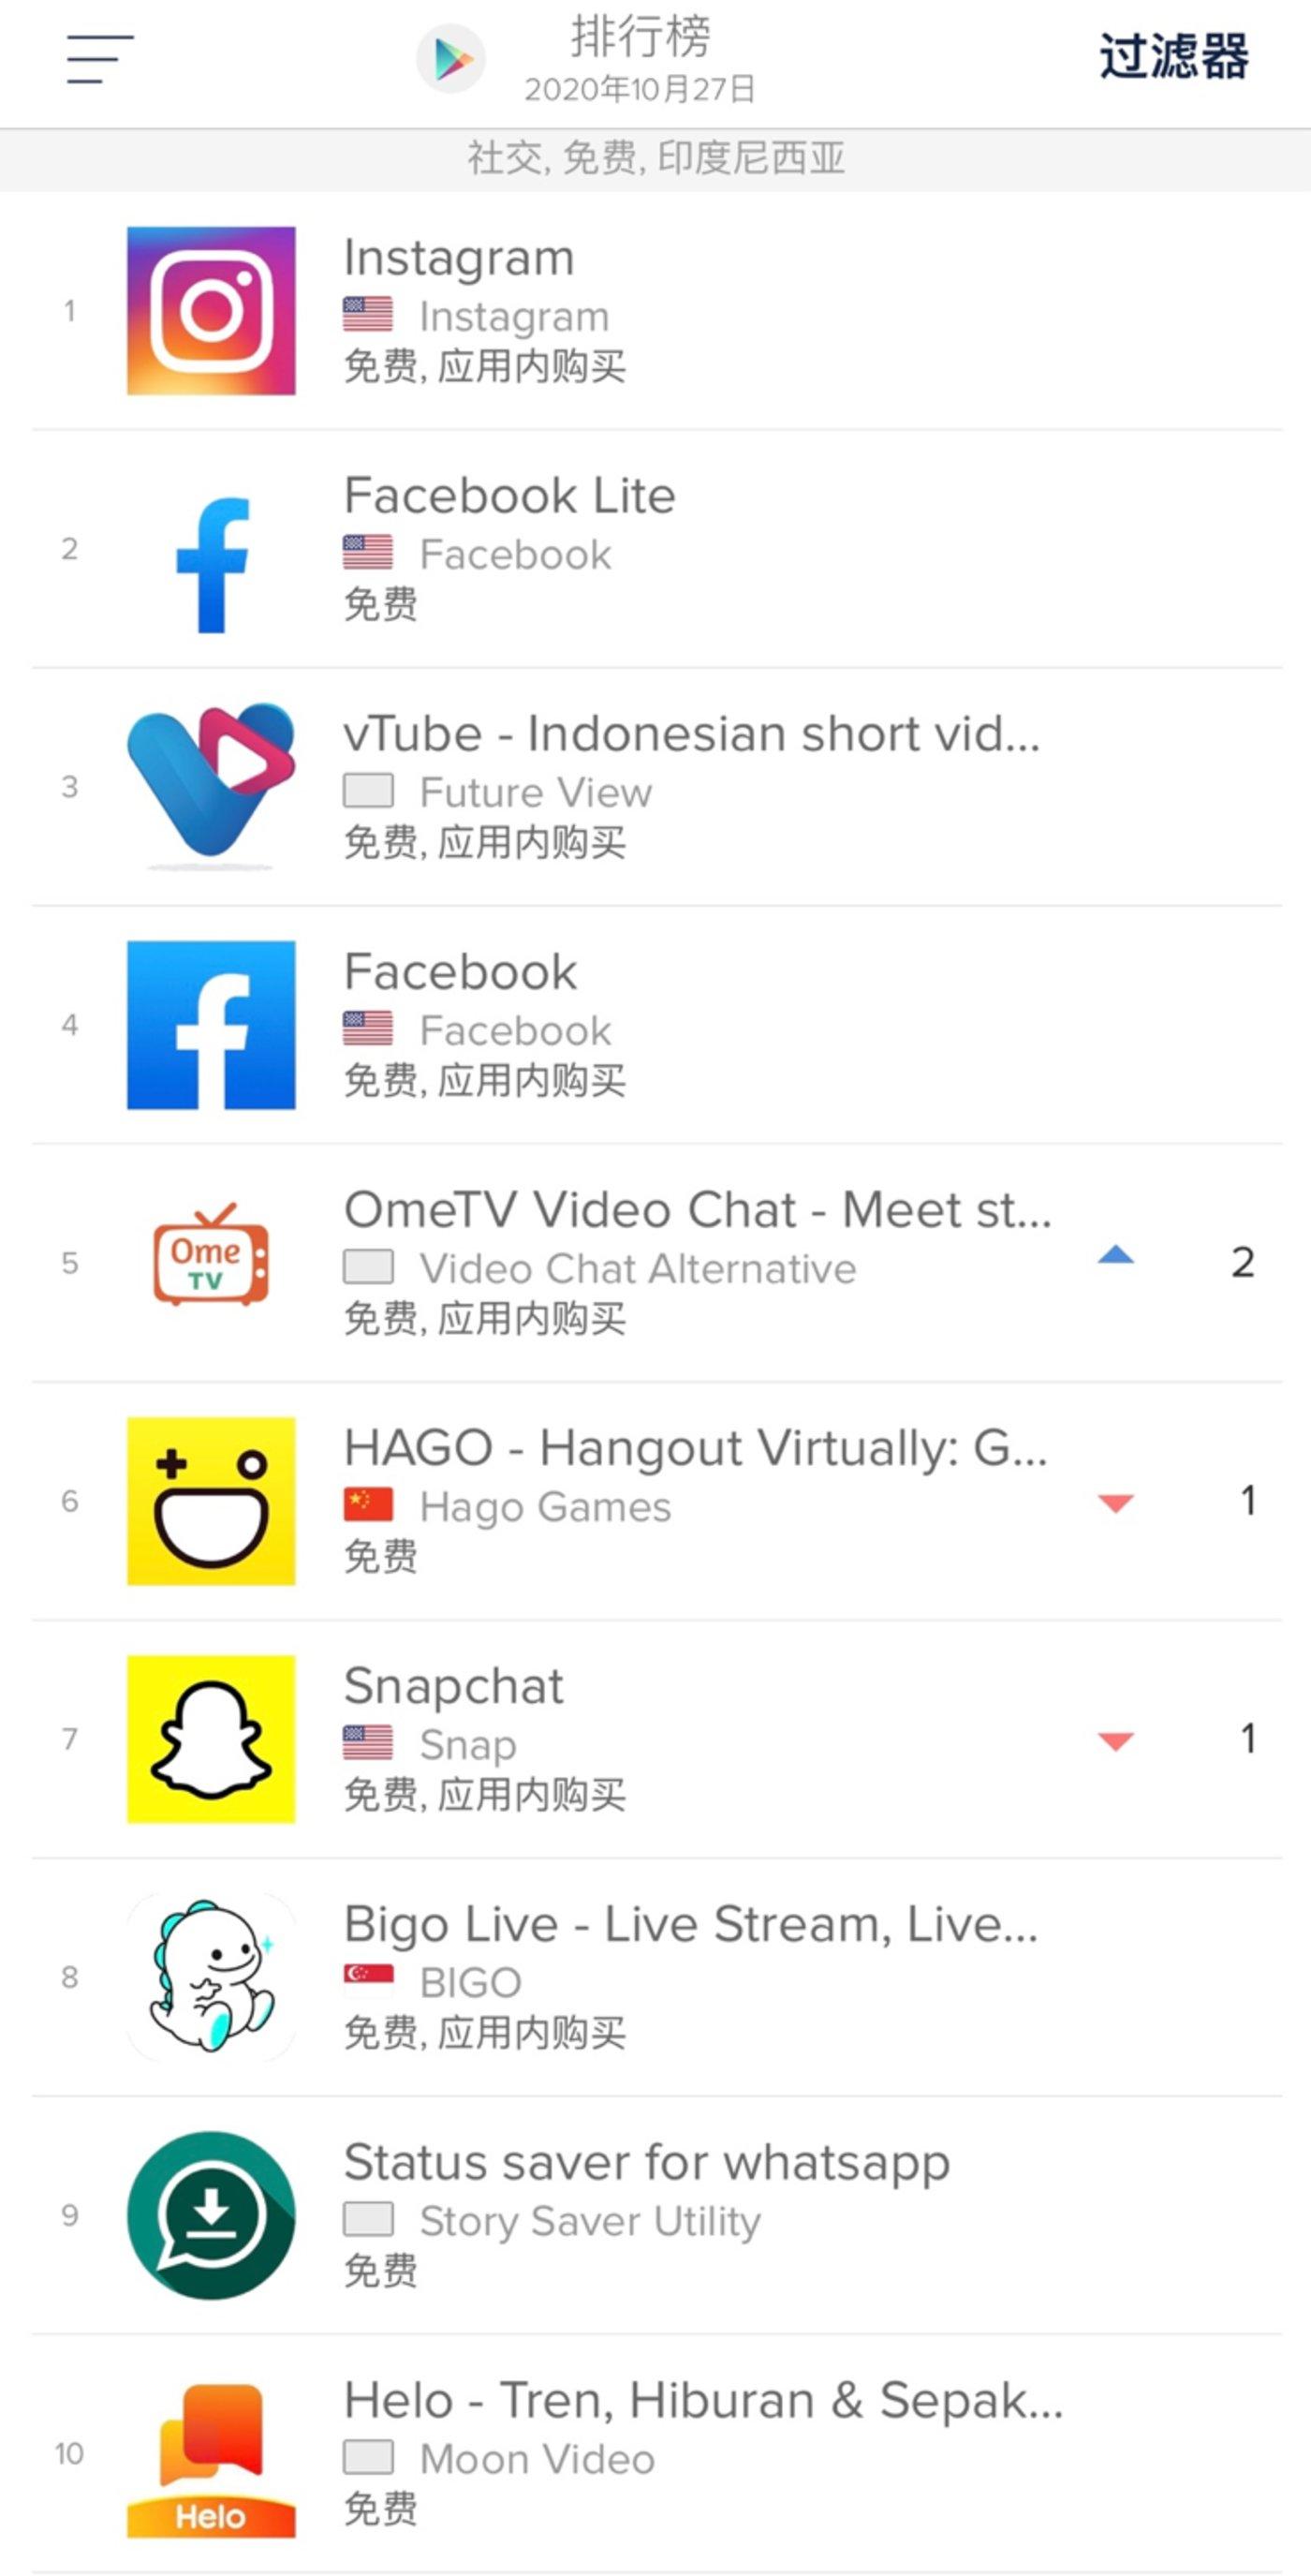 Helo在印尼社交免费排行榜中排名第十/AppAnnie